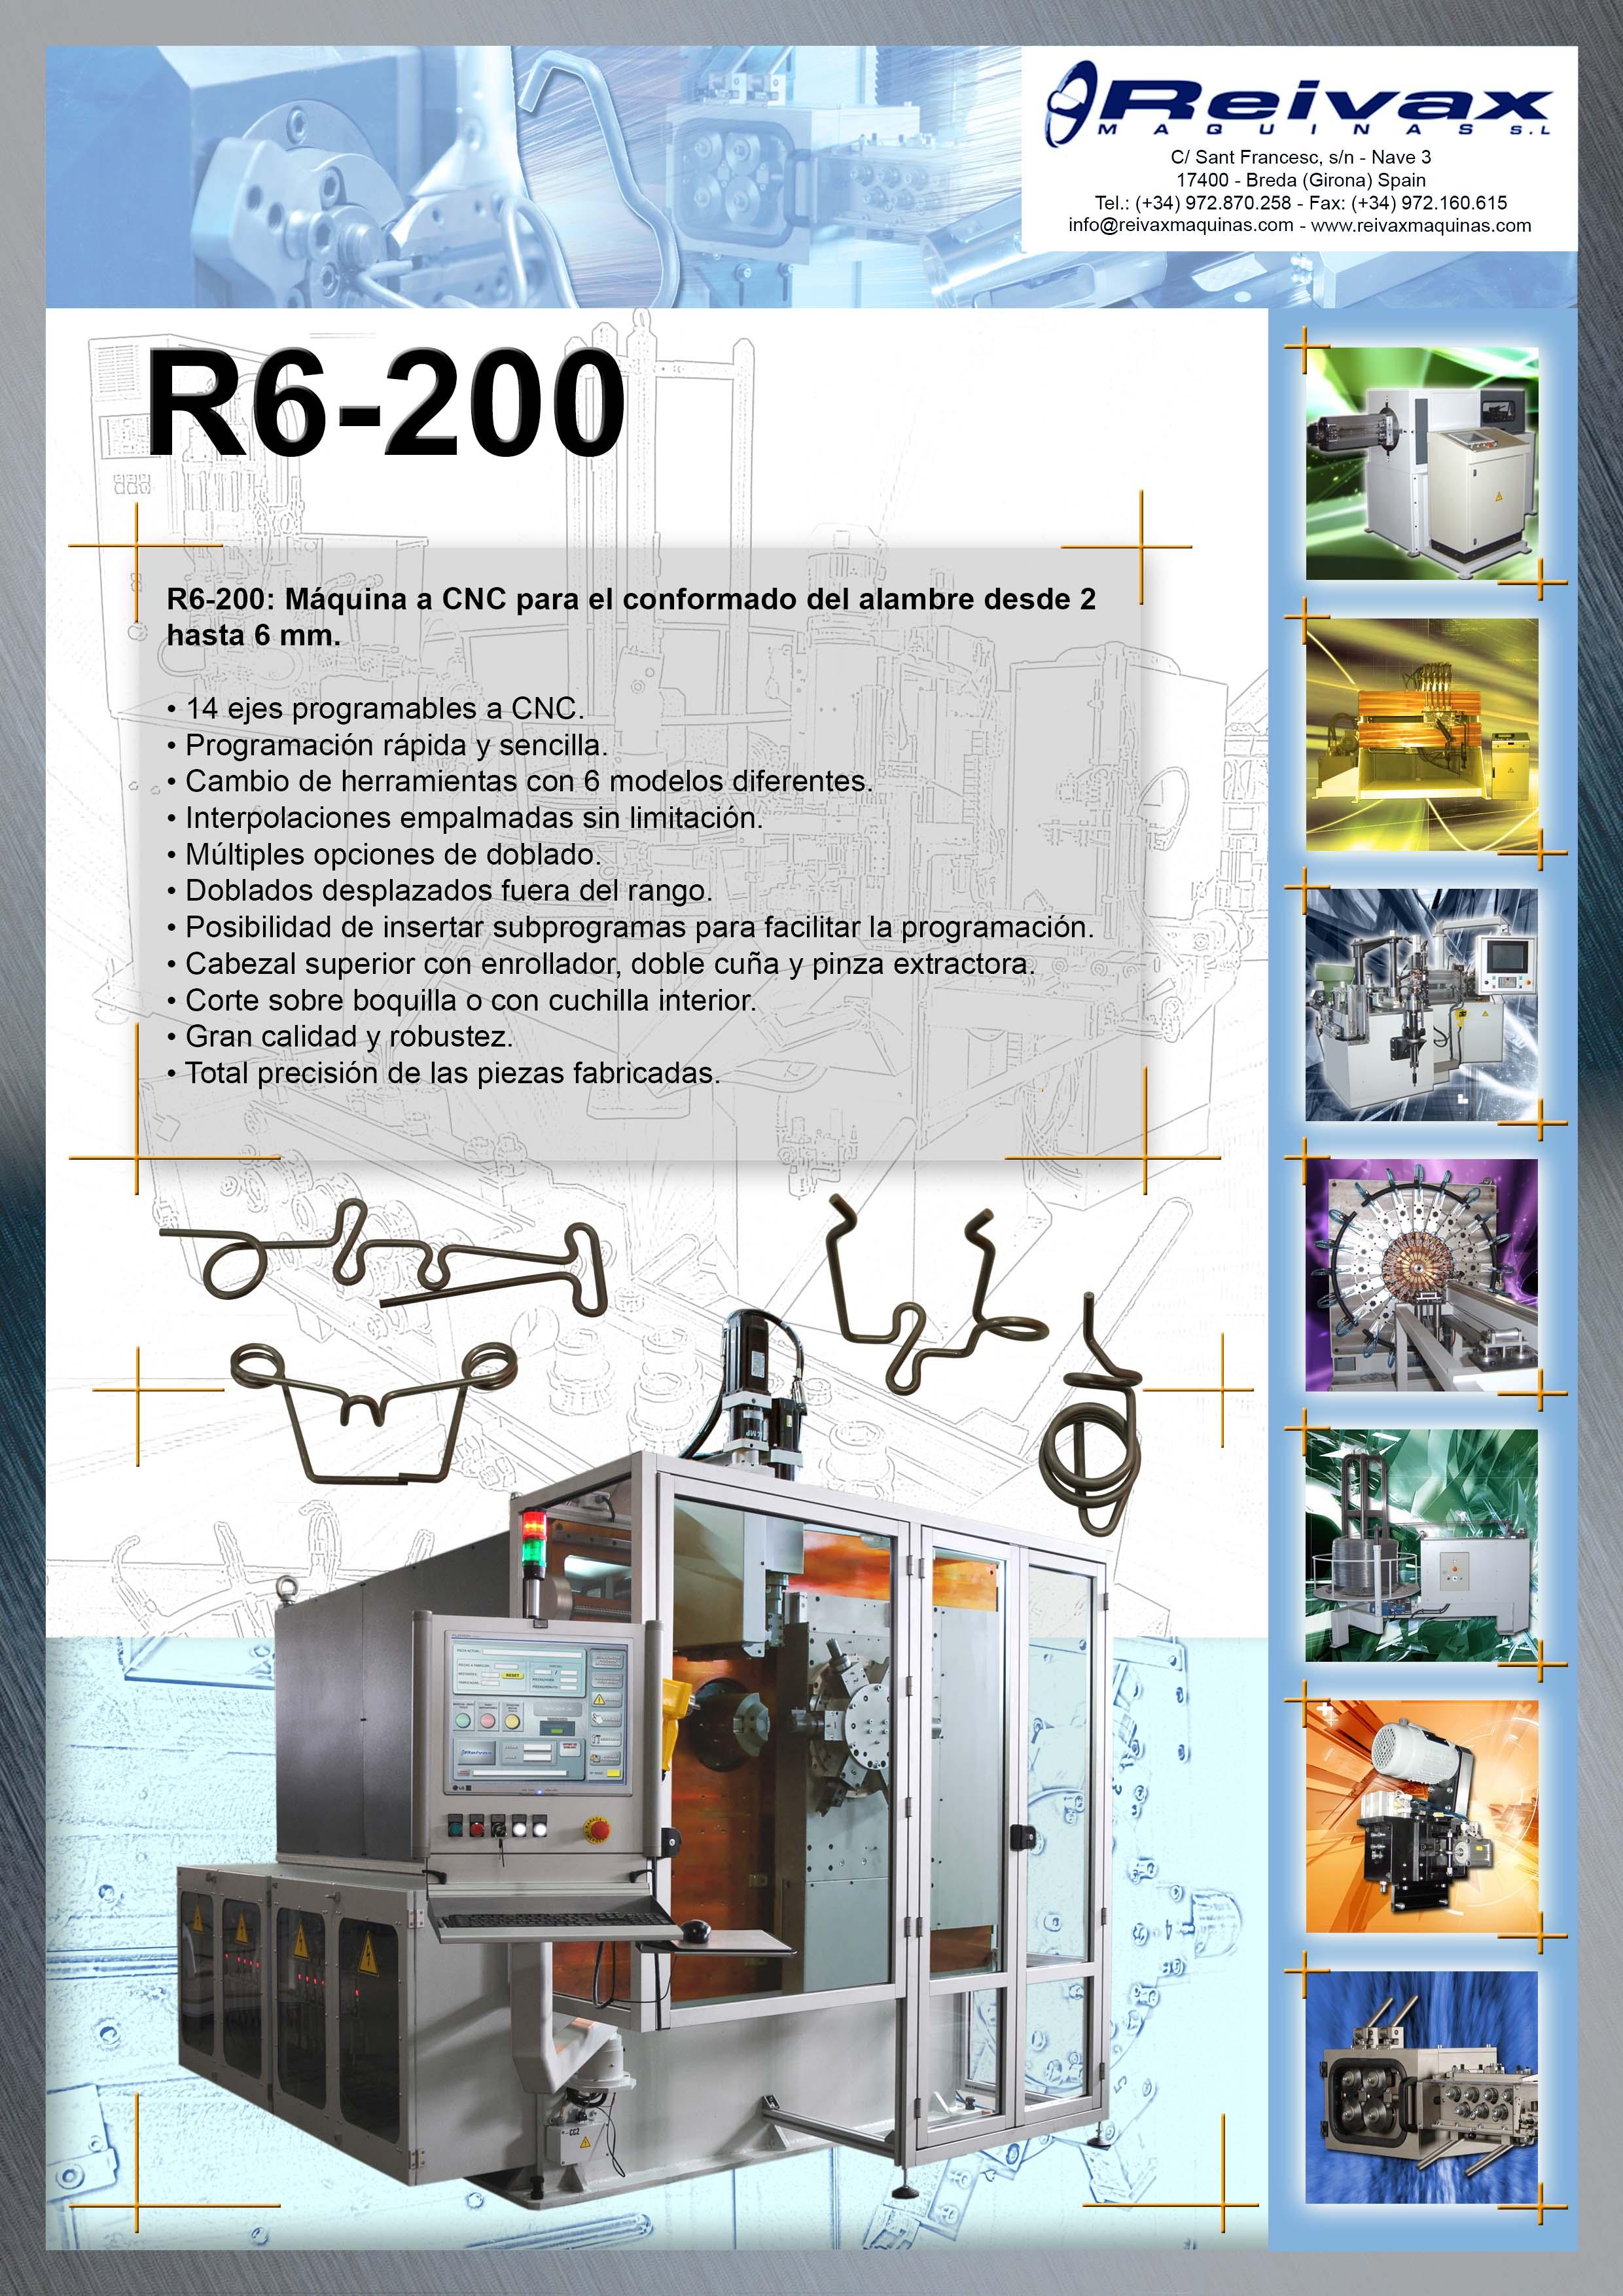 ReivaxMaquinas: Ficha Tecnica R6-200